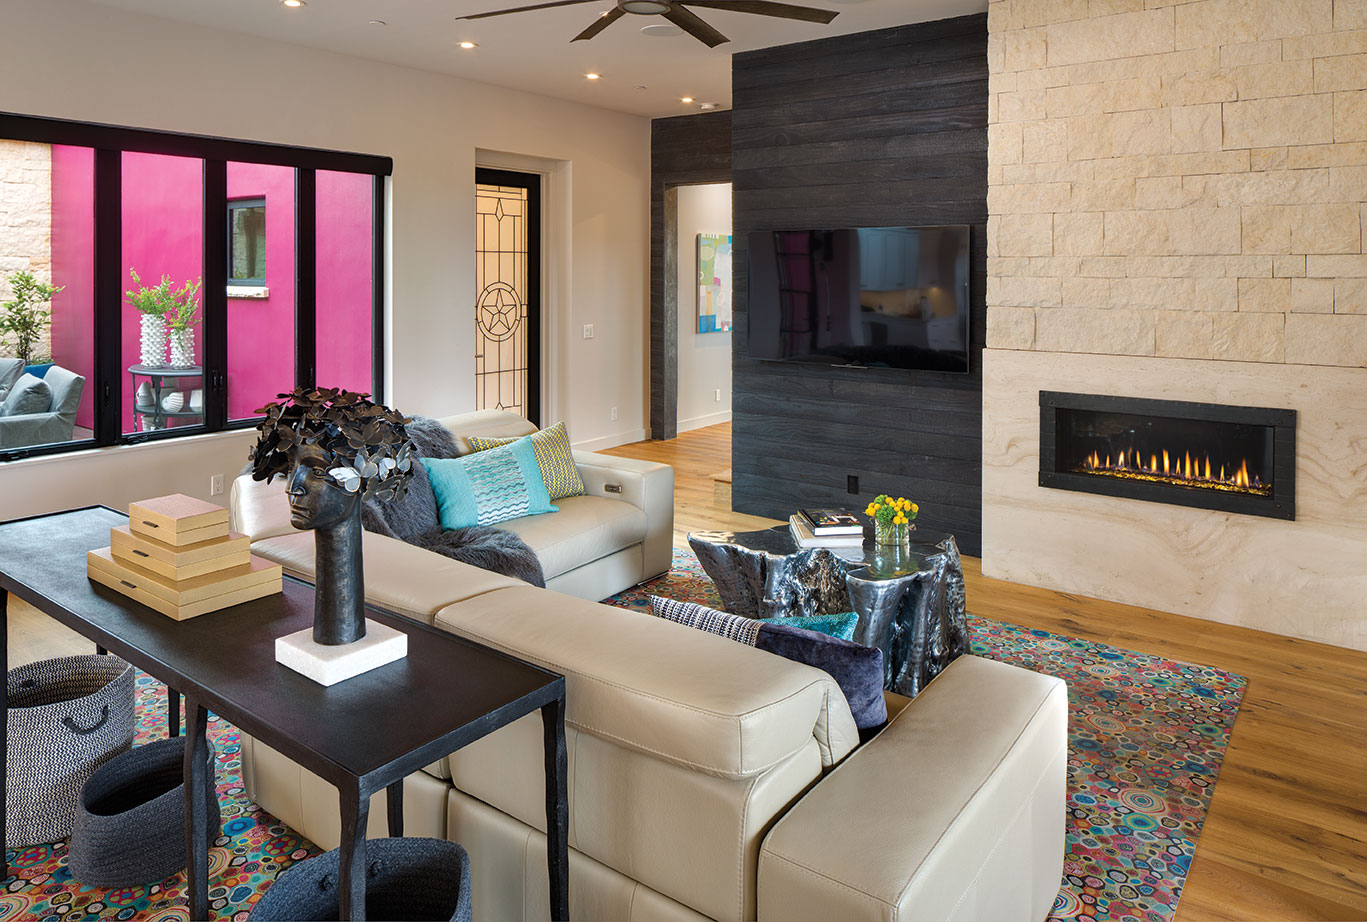 Texas in California living room san diego color Texas star shou sugi ban